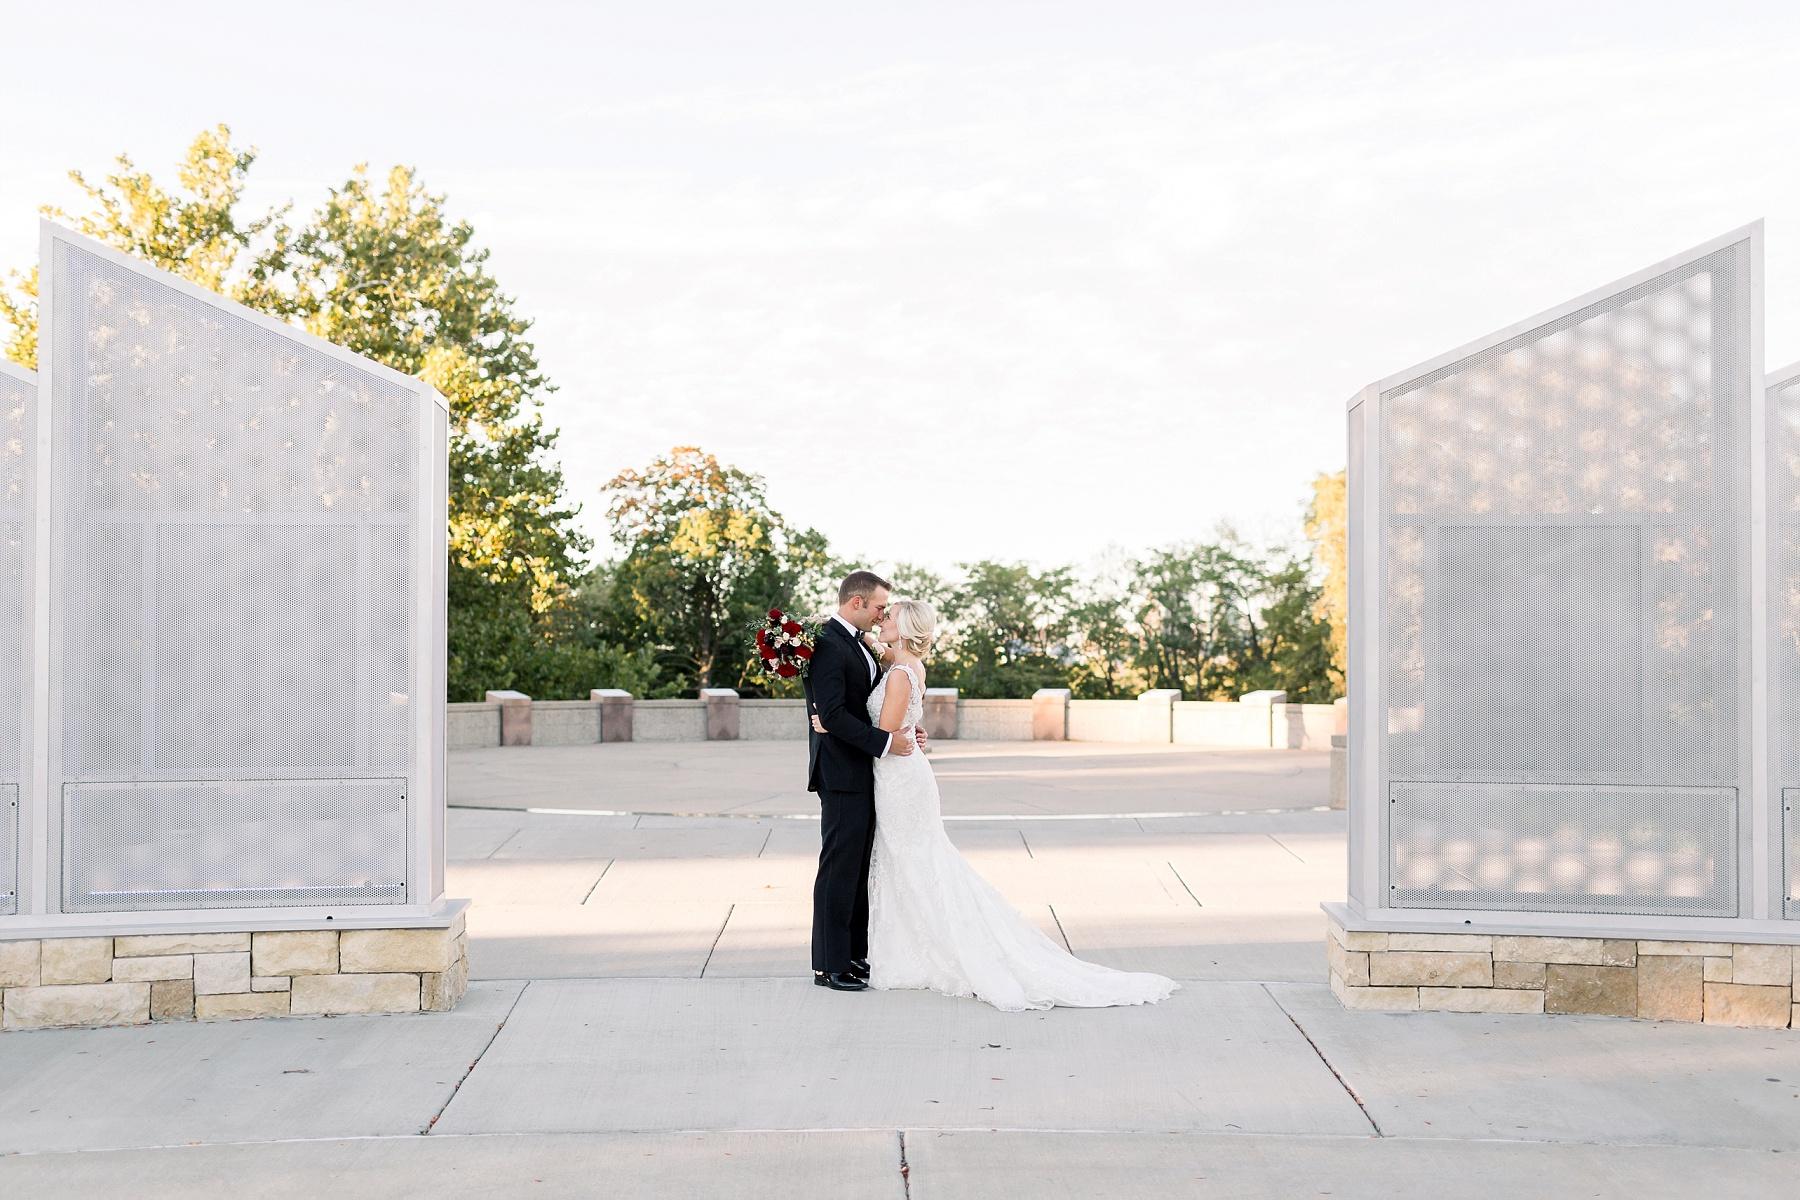 midwest-adventurous-wedding-photographer-elizabeth-ladean-photography-photo_4812.jpg